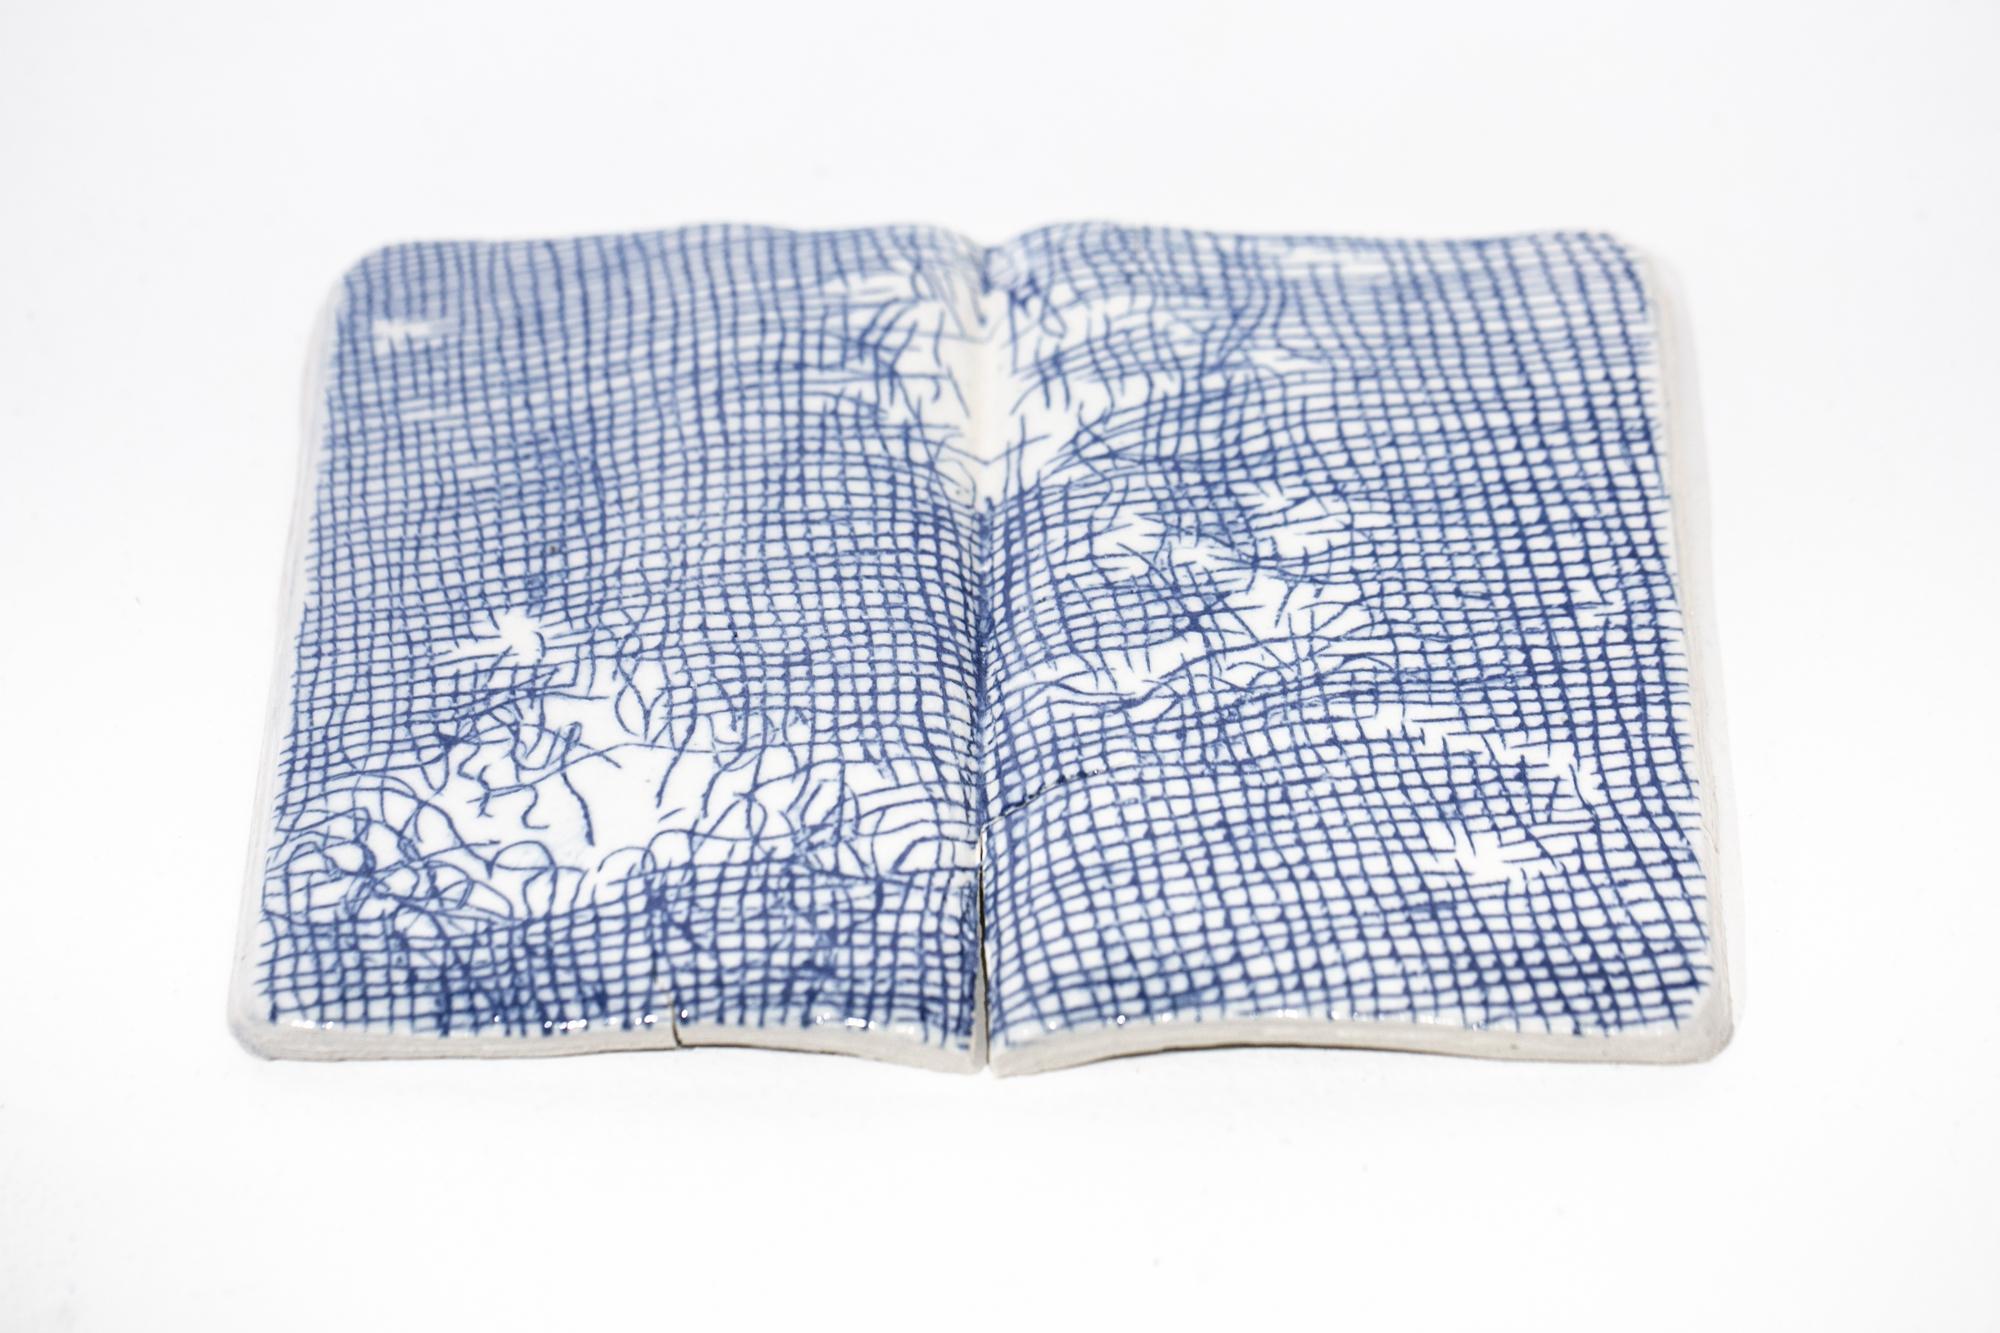 Sketchbook (small #9)